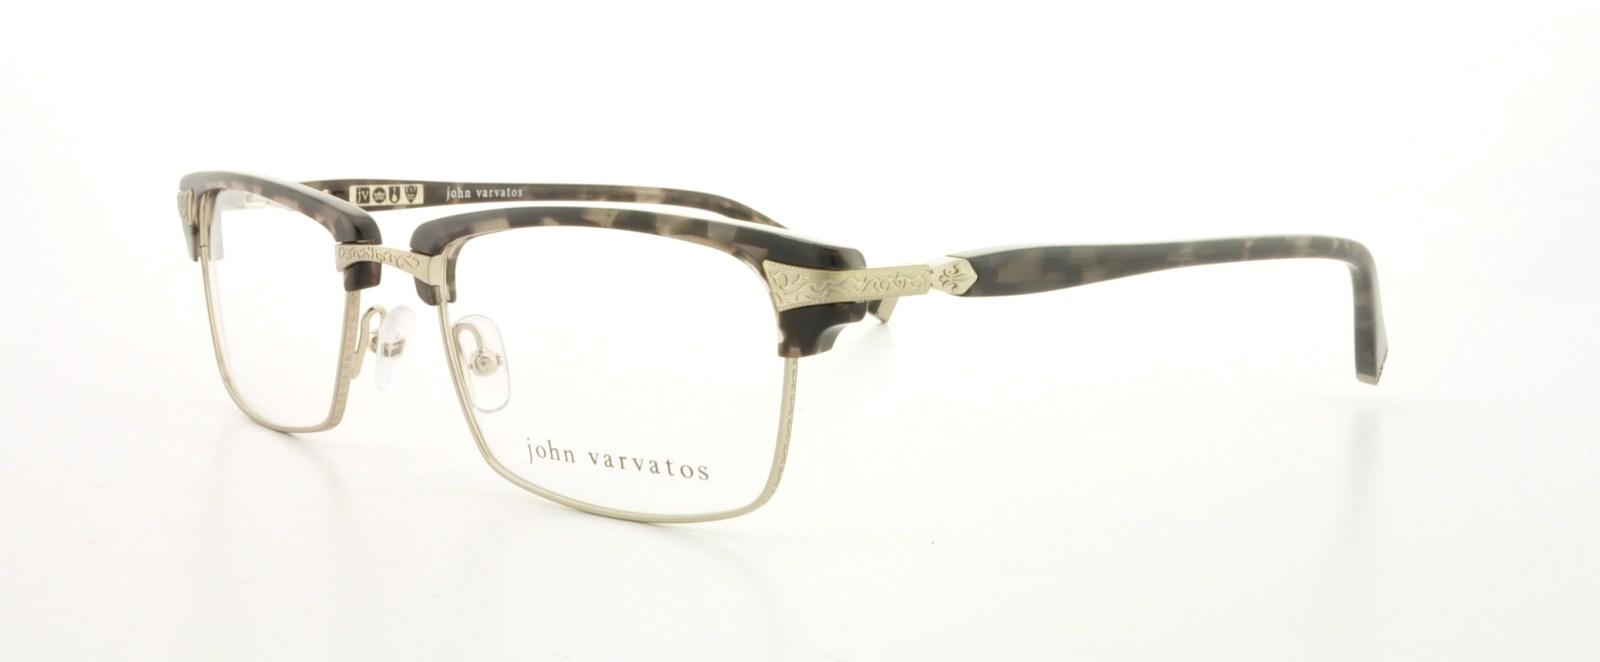 30a4350bd3 JOHN VARVATOS Eyeglasses V145 Smoke Tortoise 53MM 751286247060